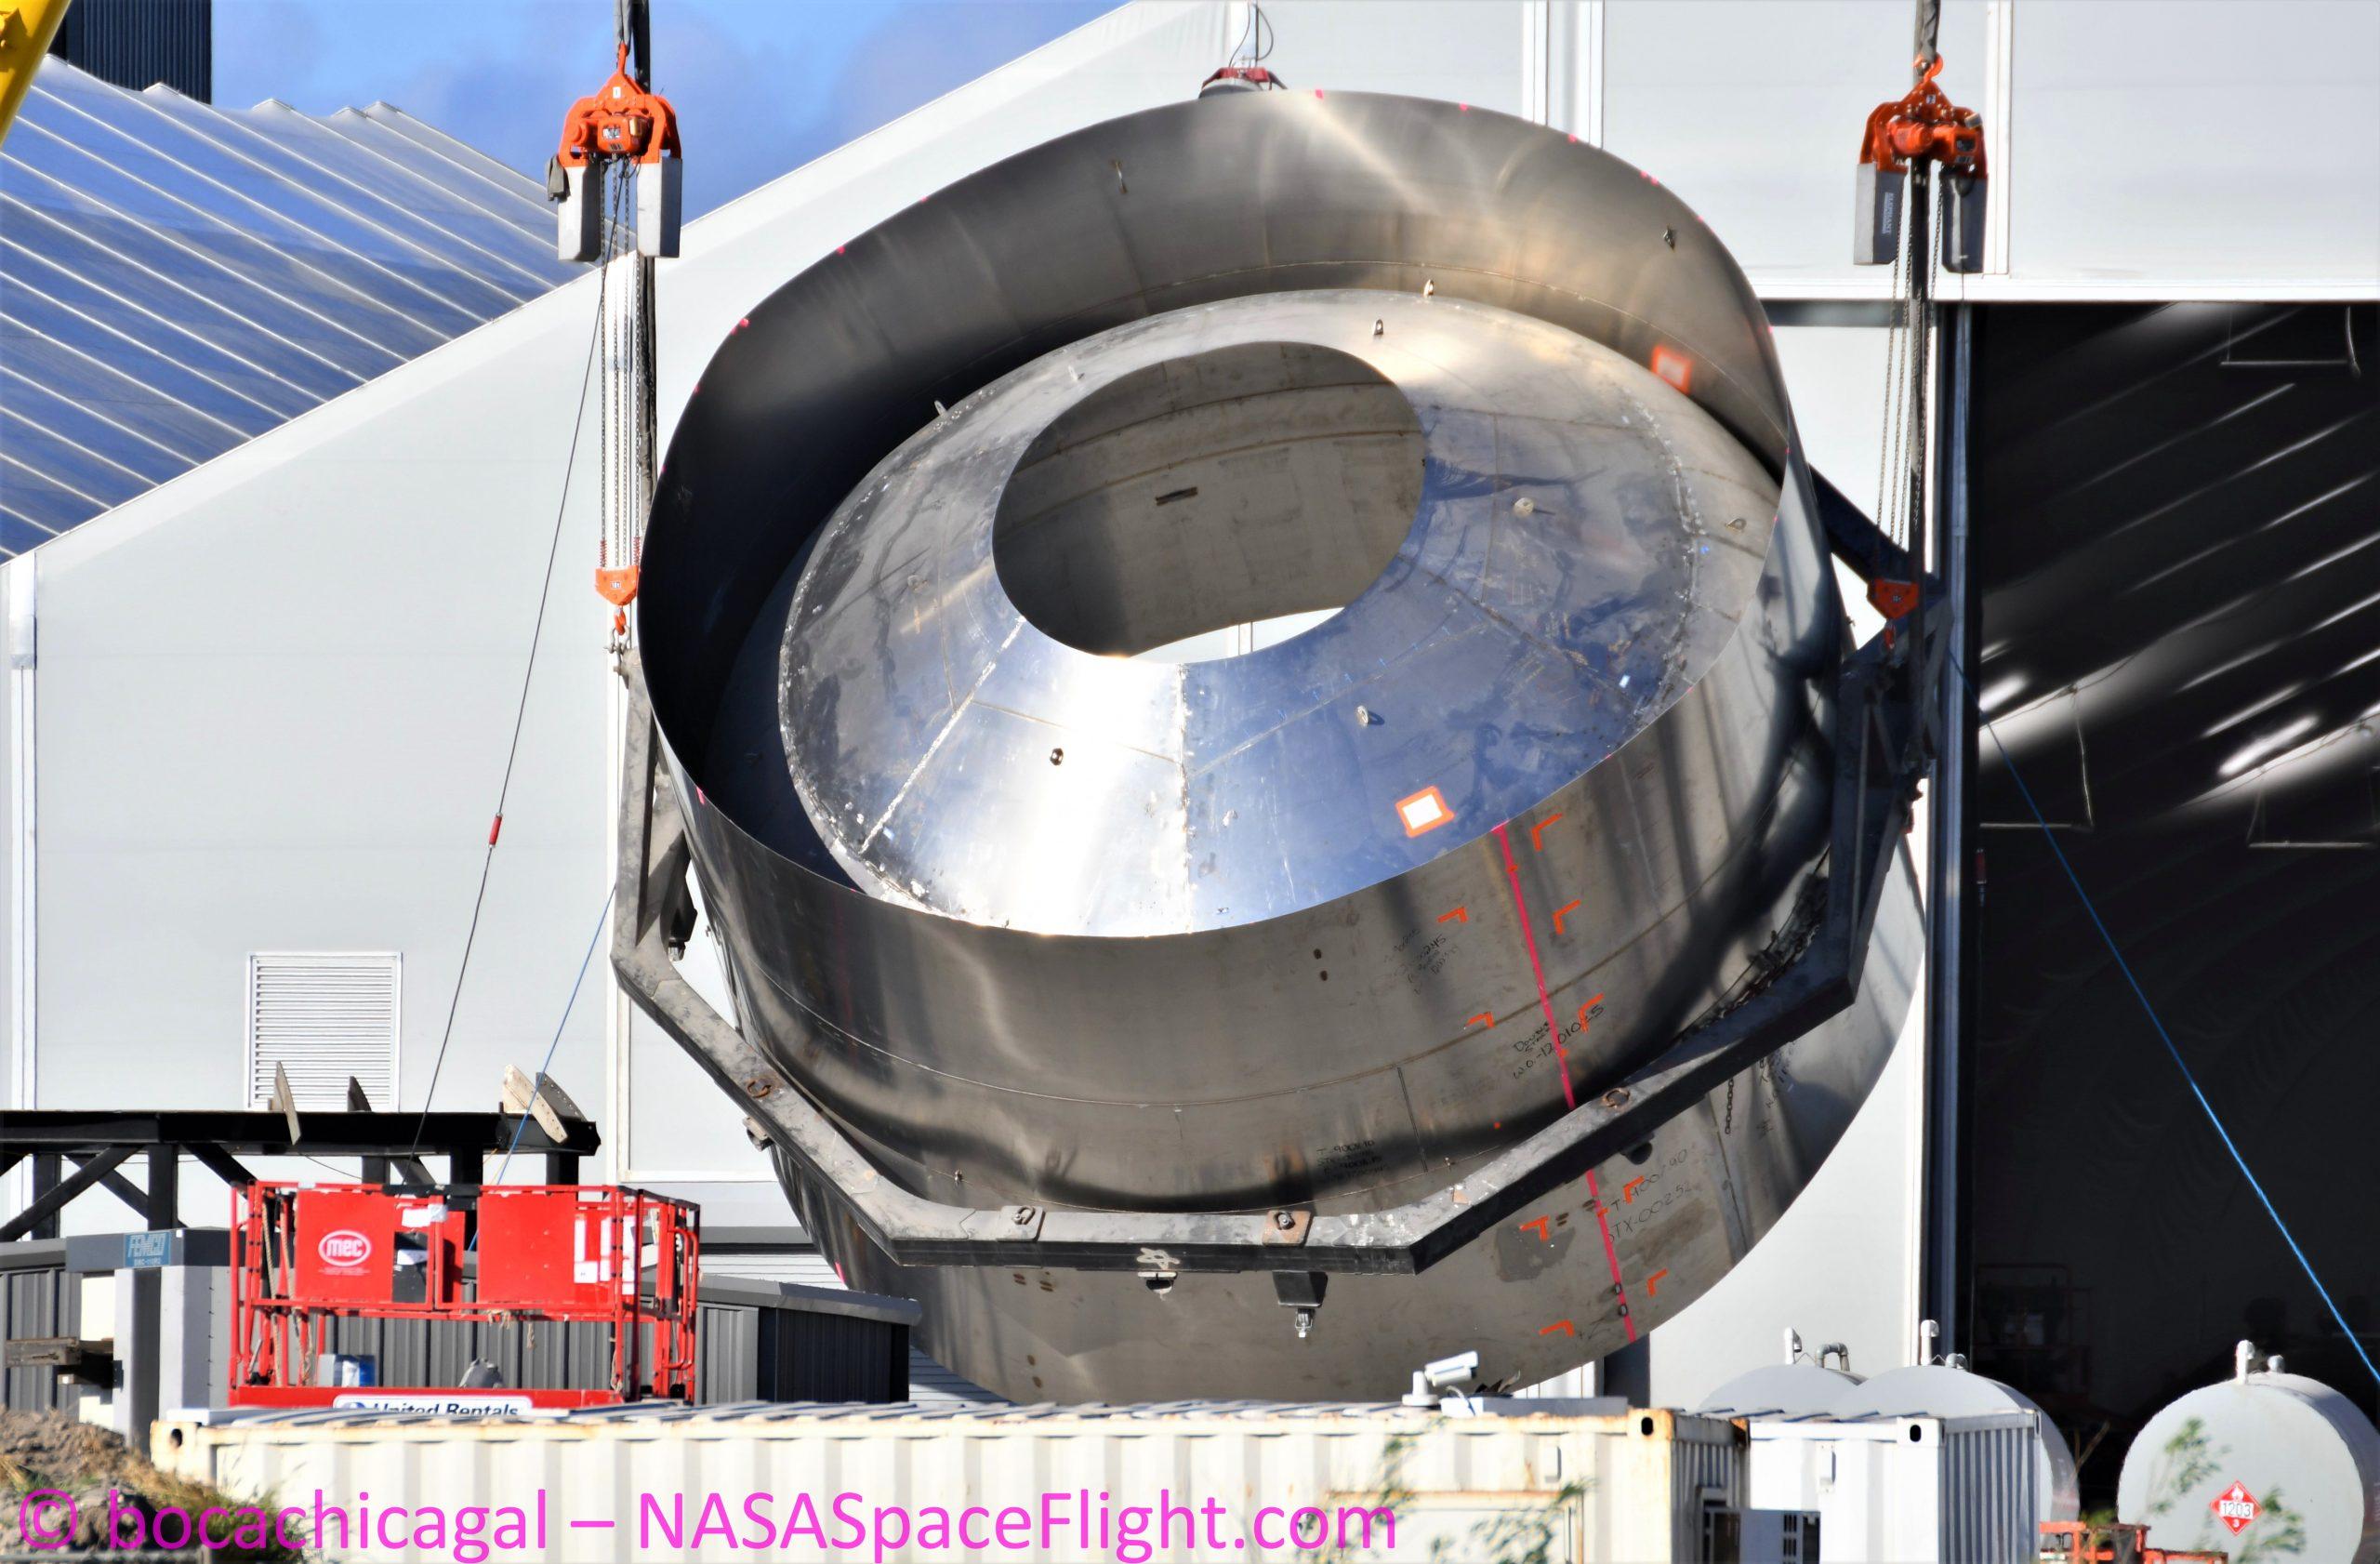 Starship Boca Chica 072220 (NASASpaceflight – bocachicagal) SN8 common dome 2